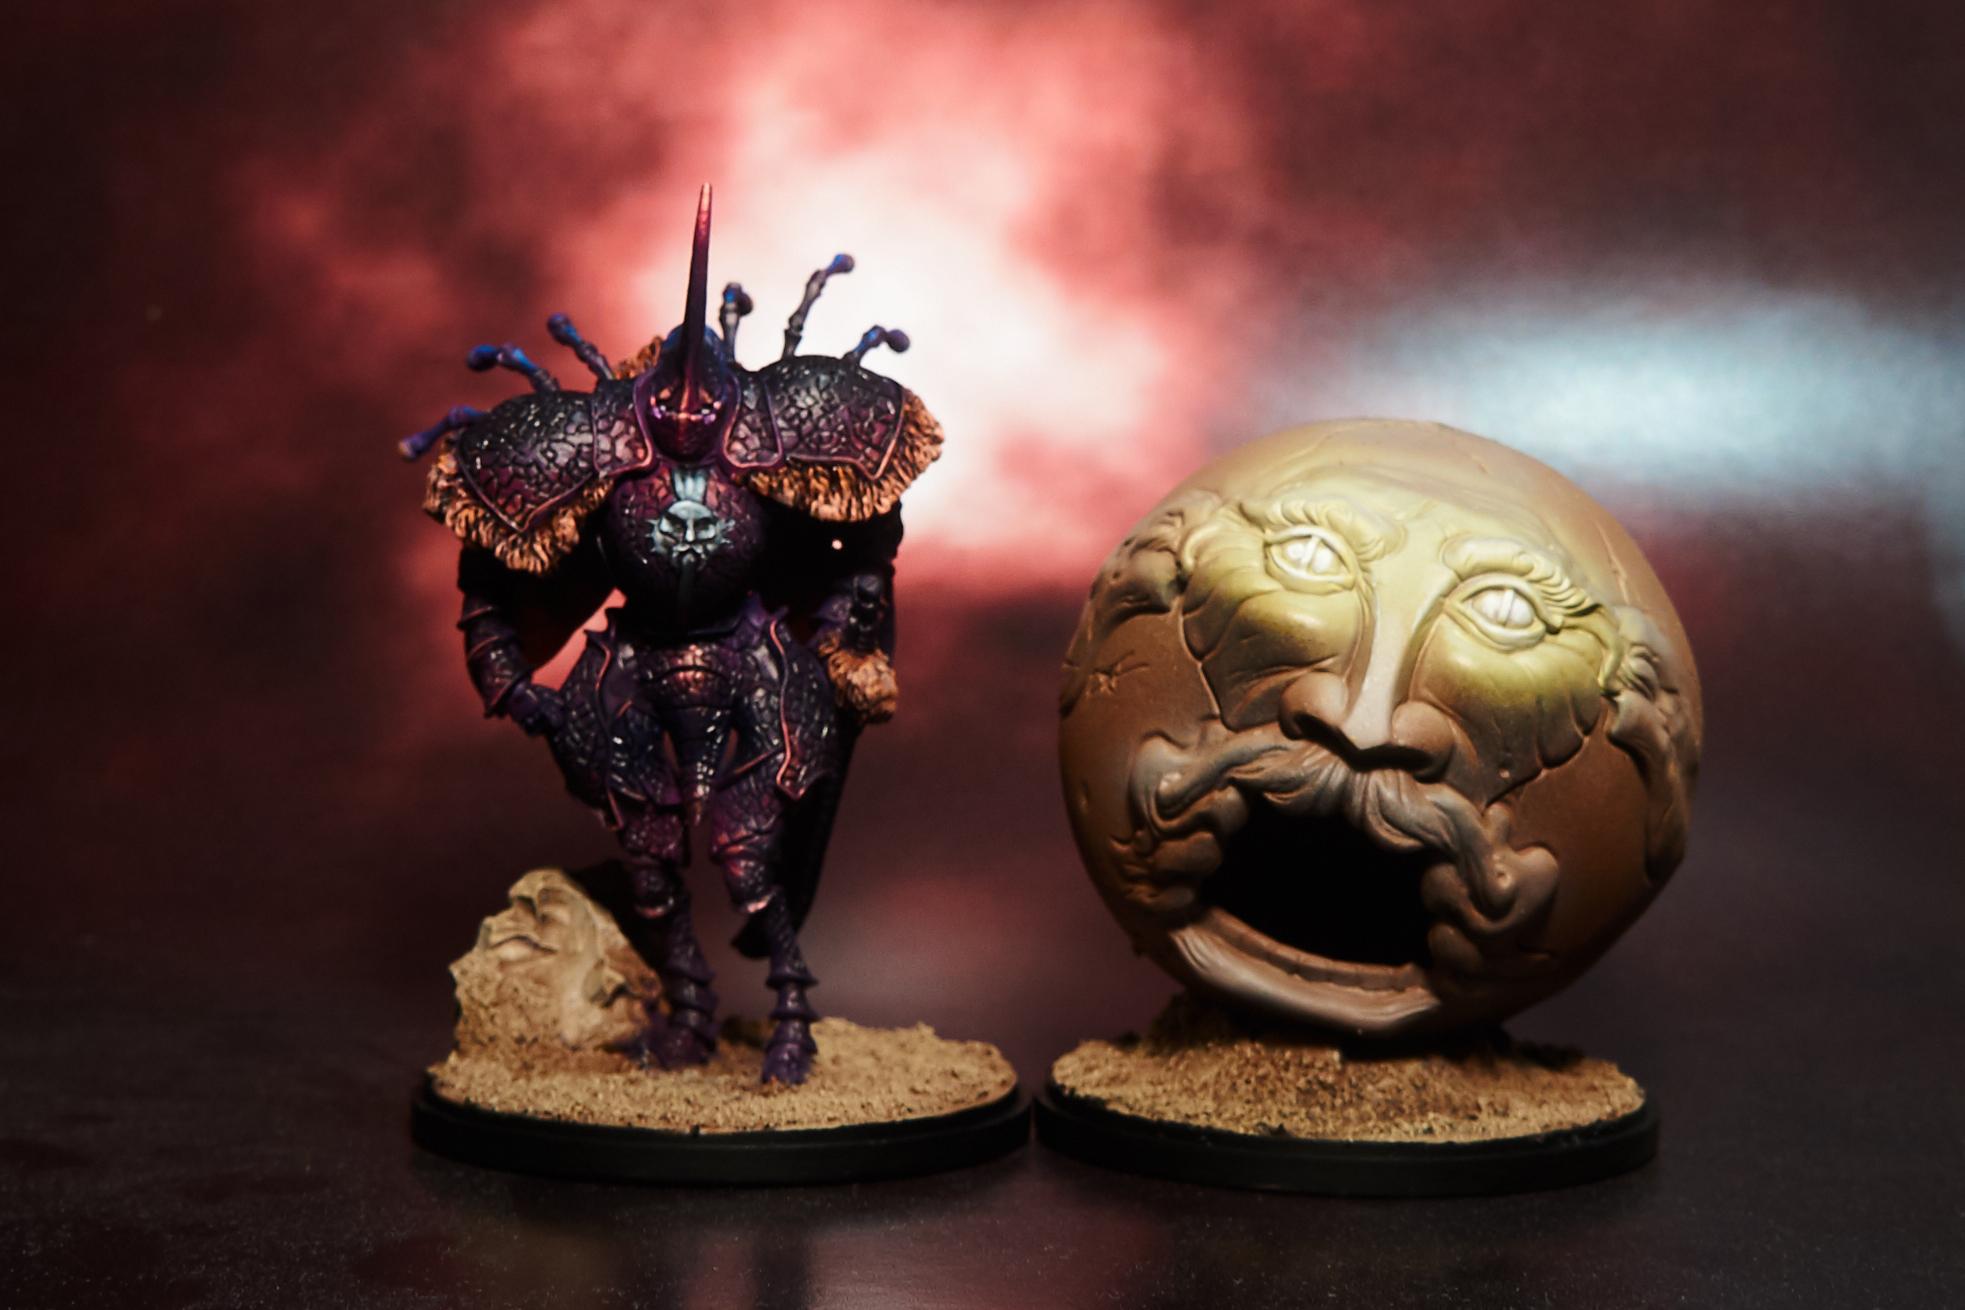 Kingdom Death - Dung Beetle